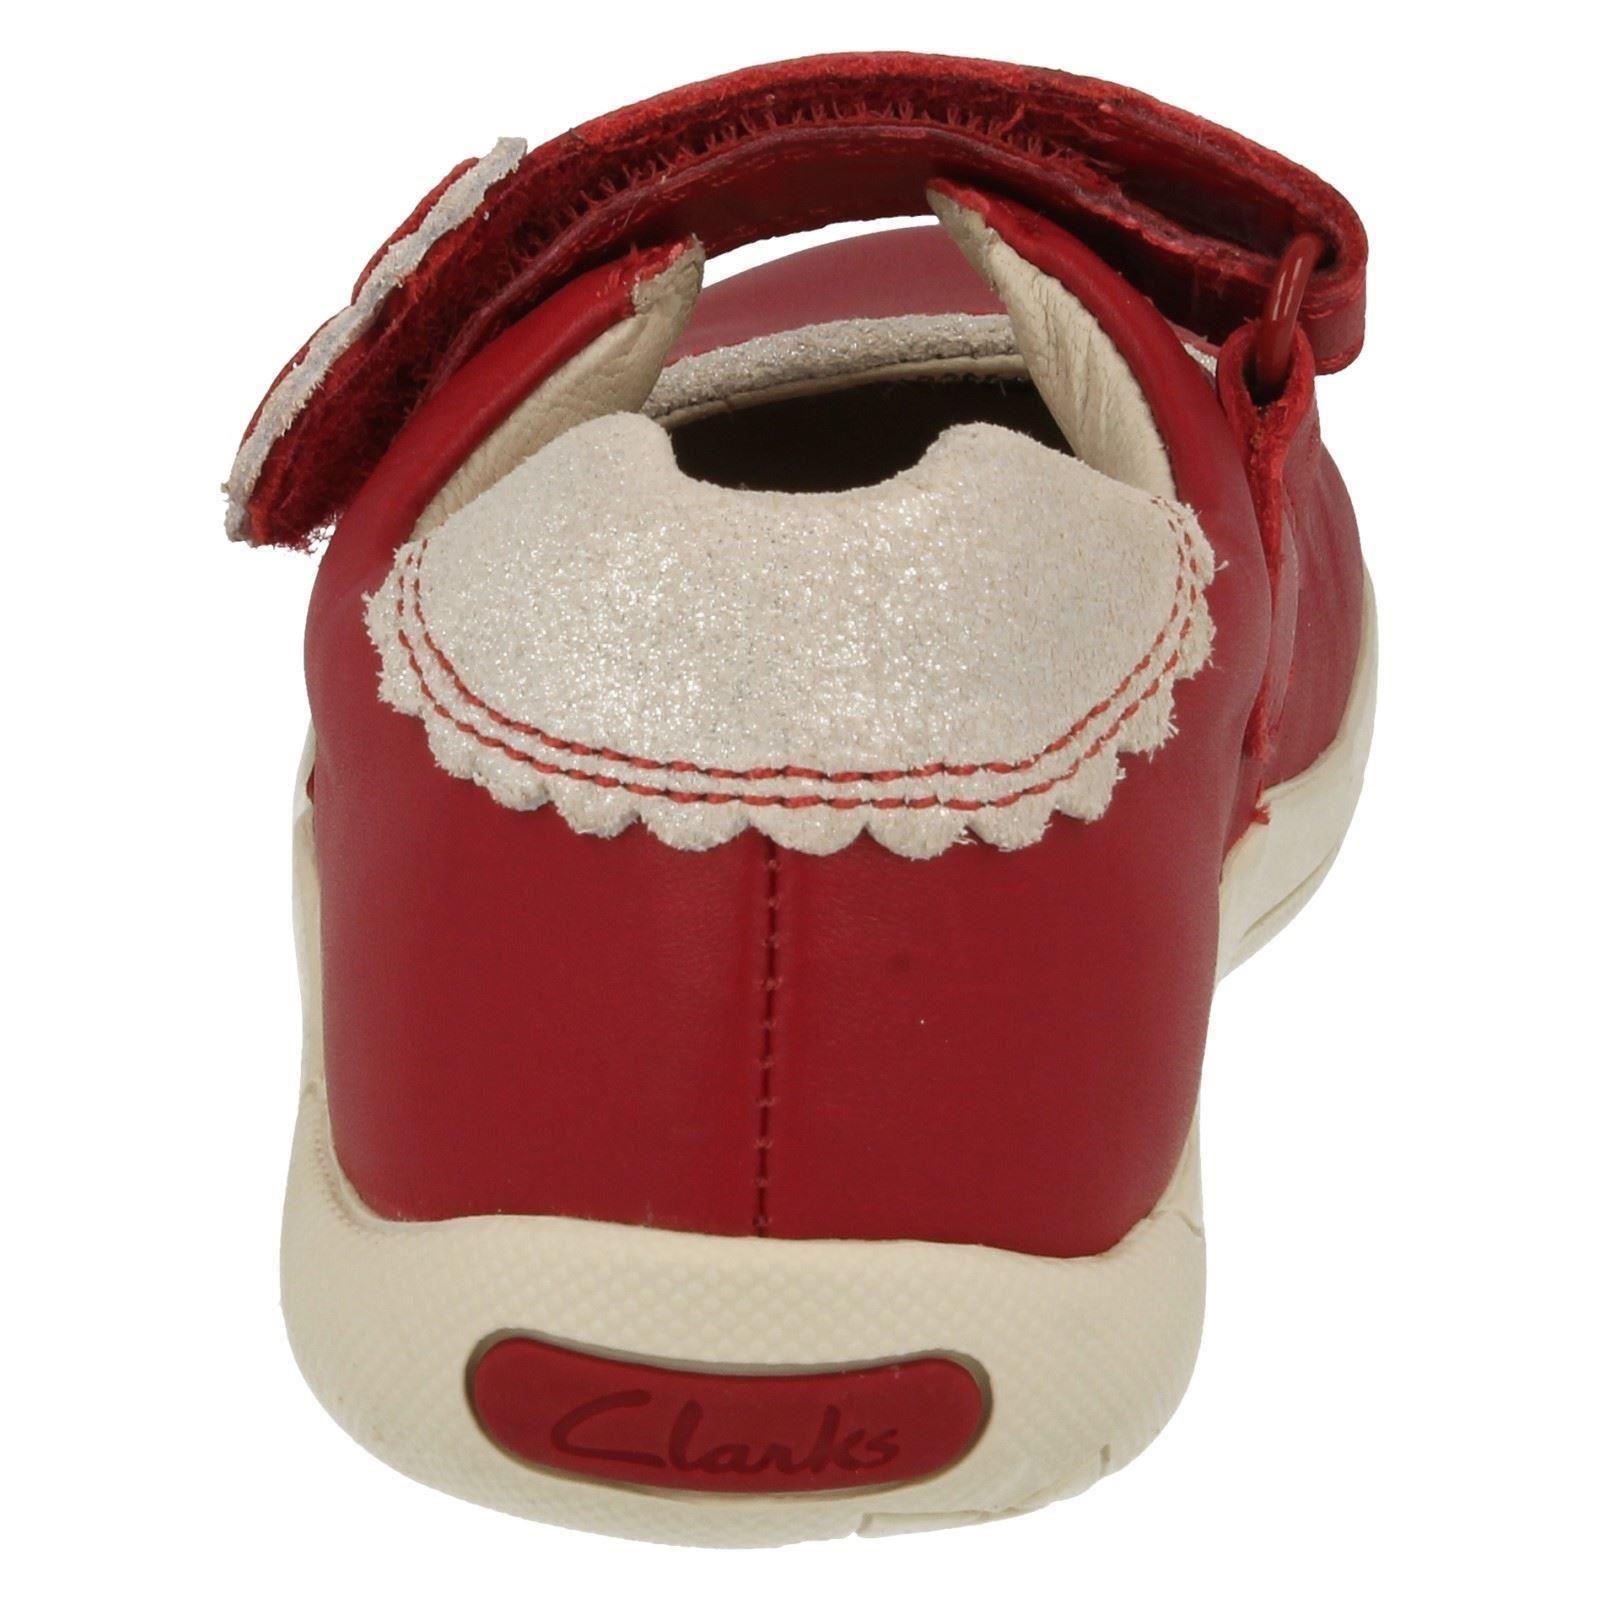 Girls Clarks Casual Shoes /'Binnie Heart/'